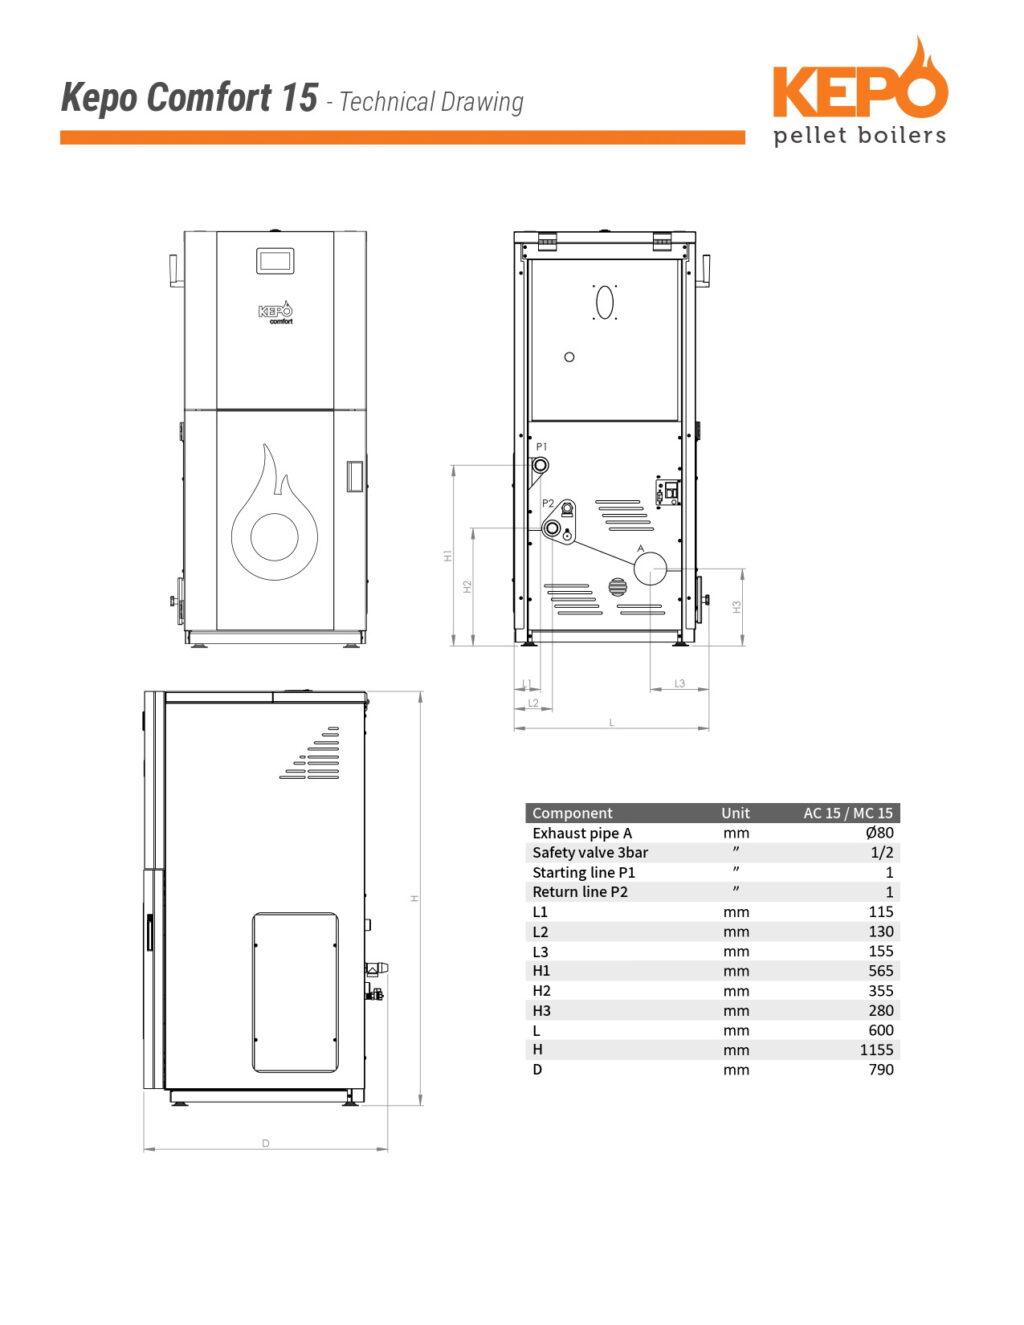 Kepo Comfort15 Techical Drawing